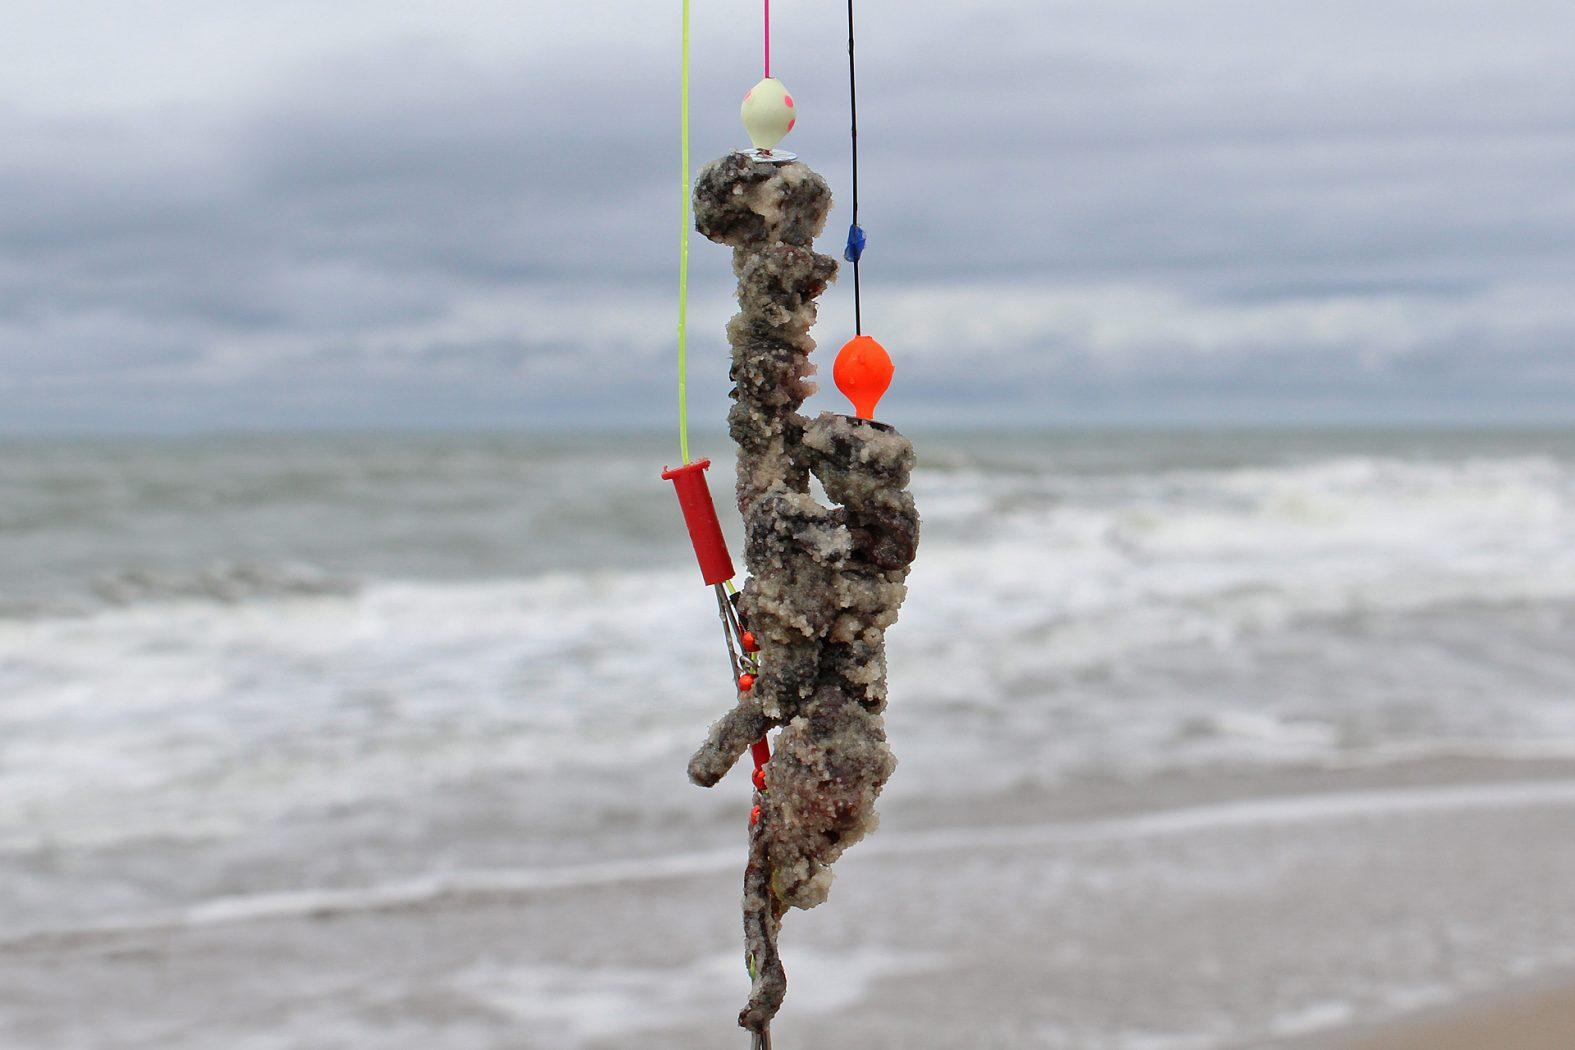 Konservierte Wattwürmer zum Brandungsangeln